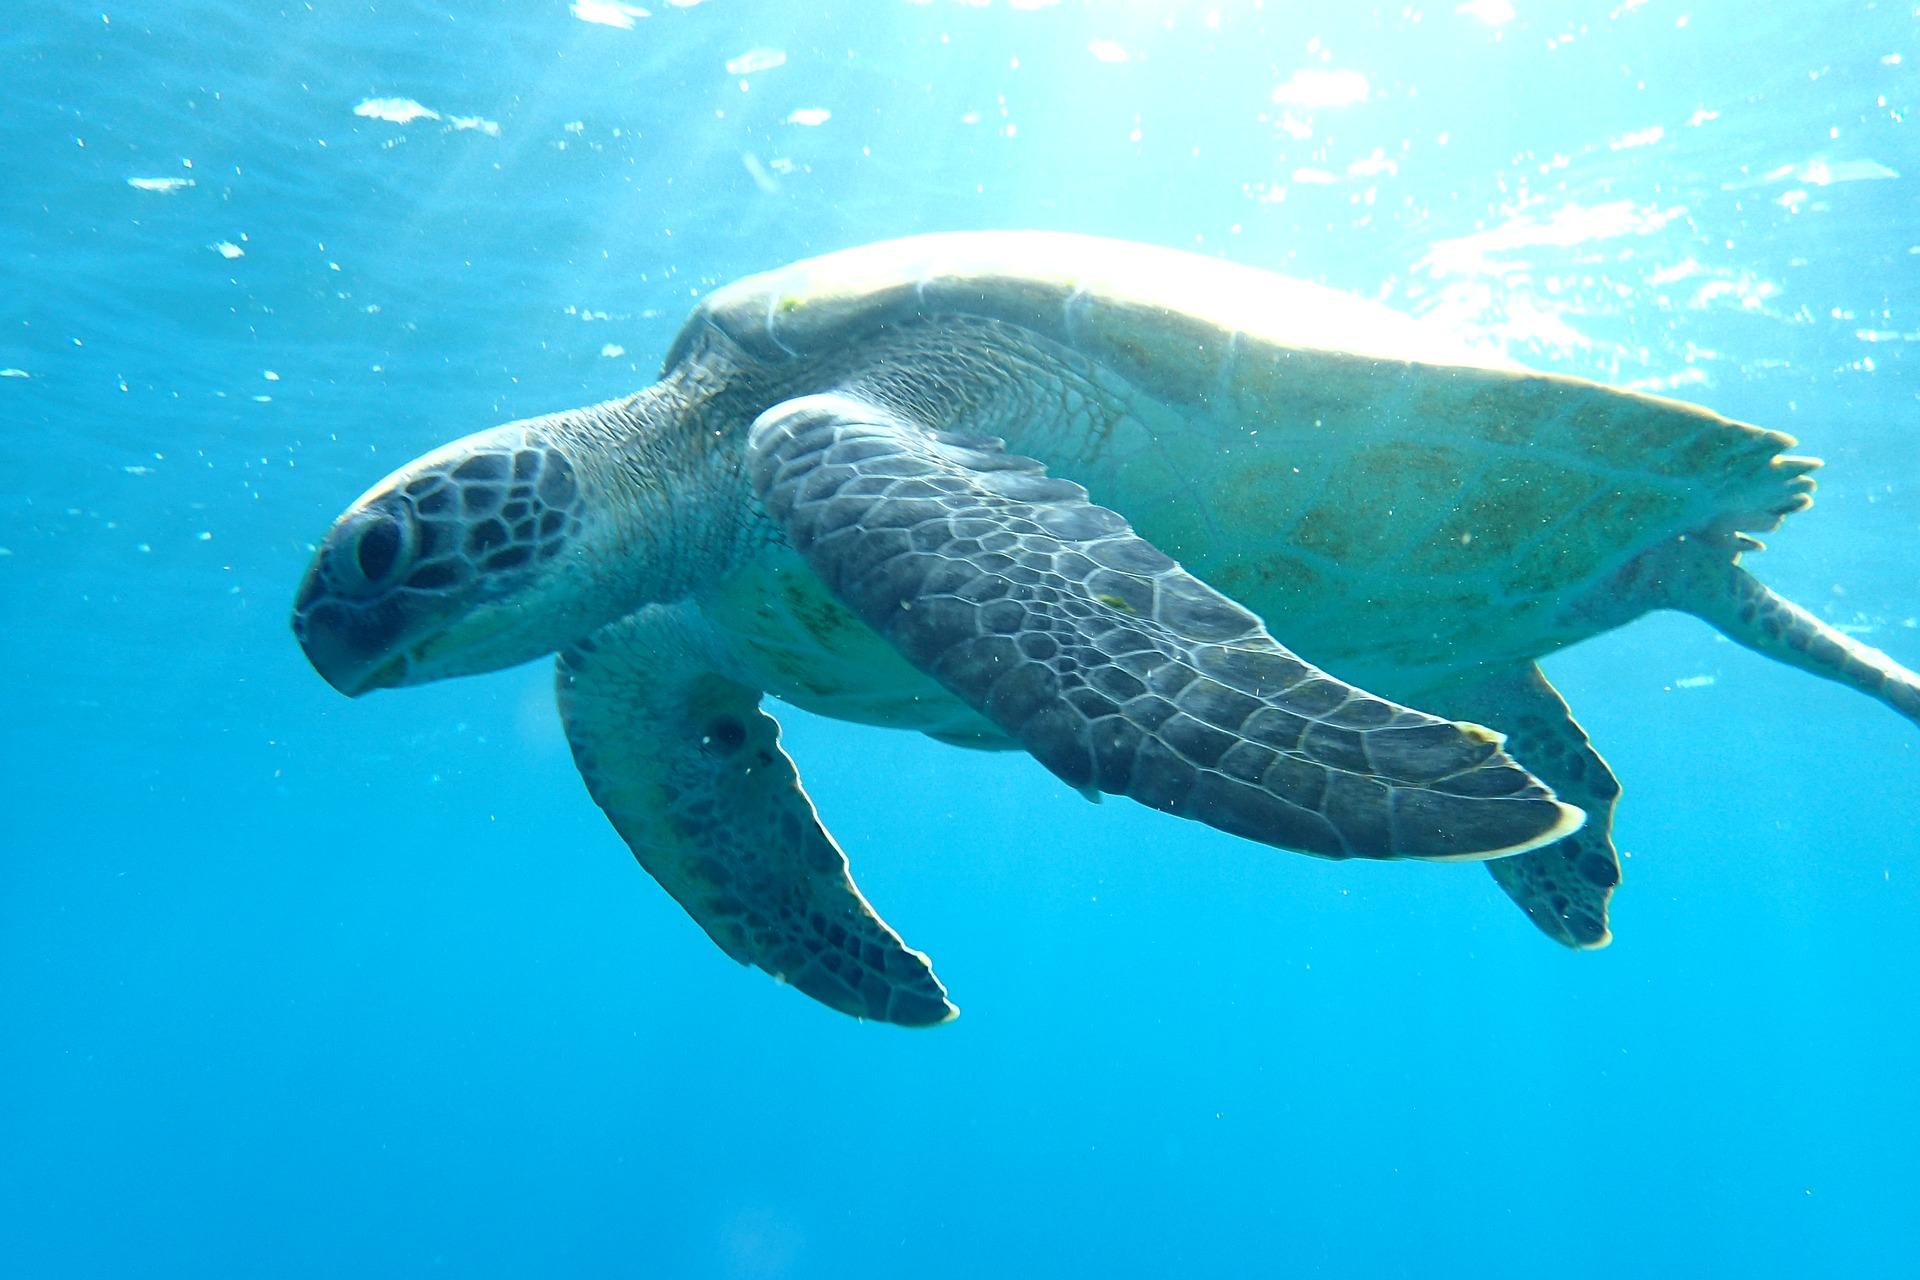 sea turtle swimming in blue ocean